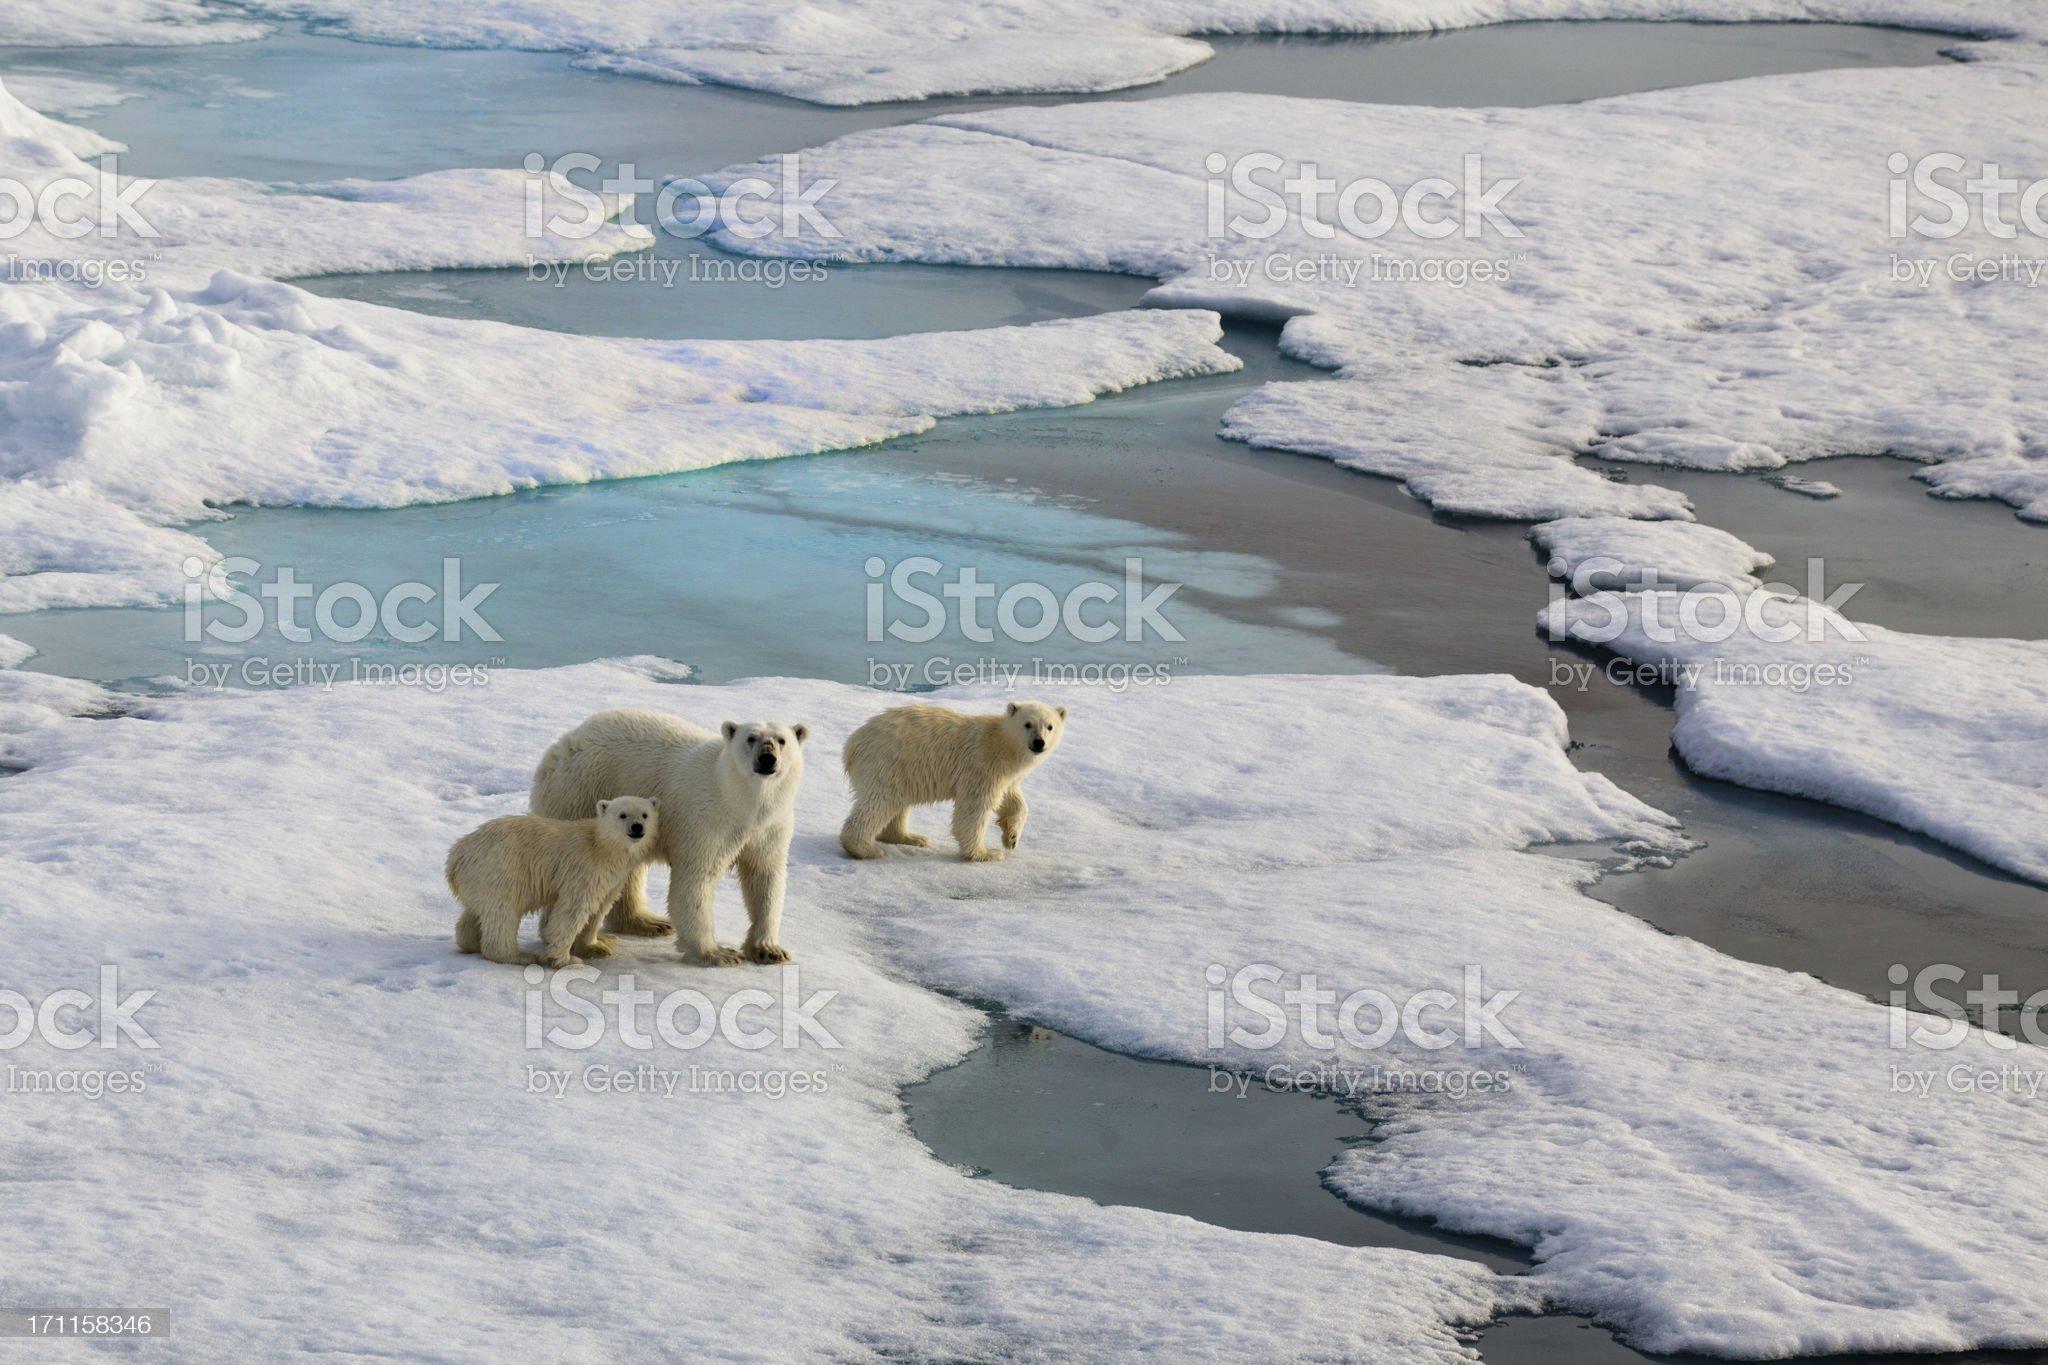 Three Polar bears on an ice flow royalty-free stock photo